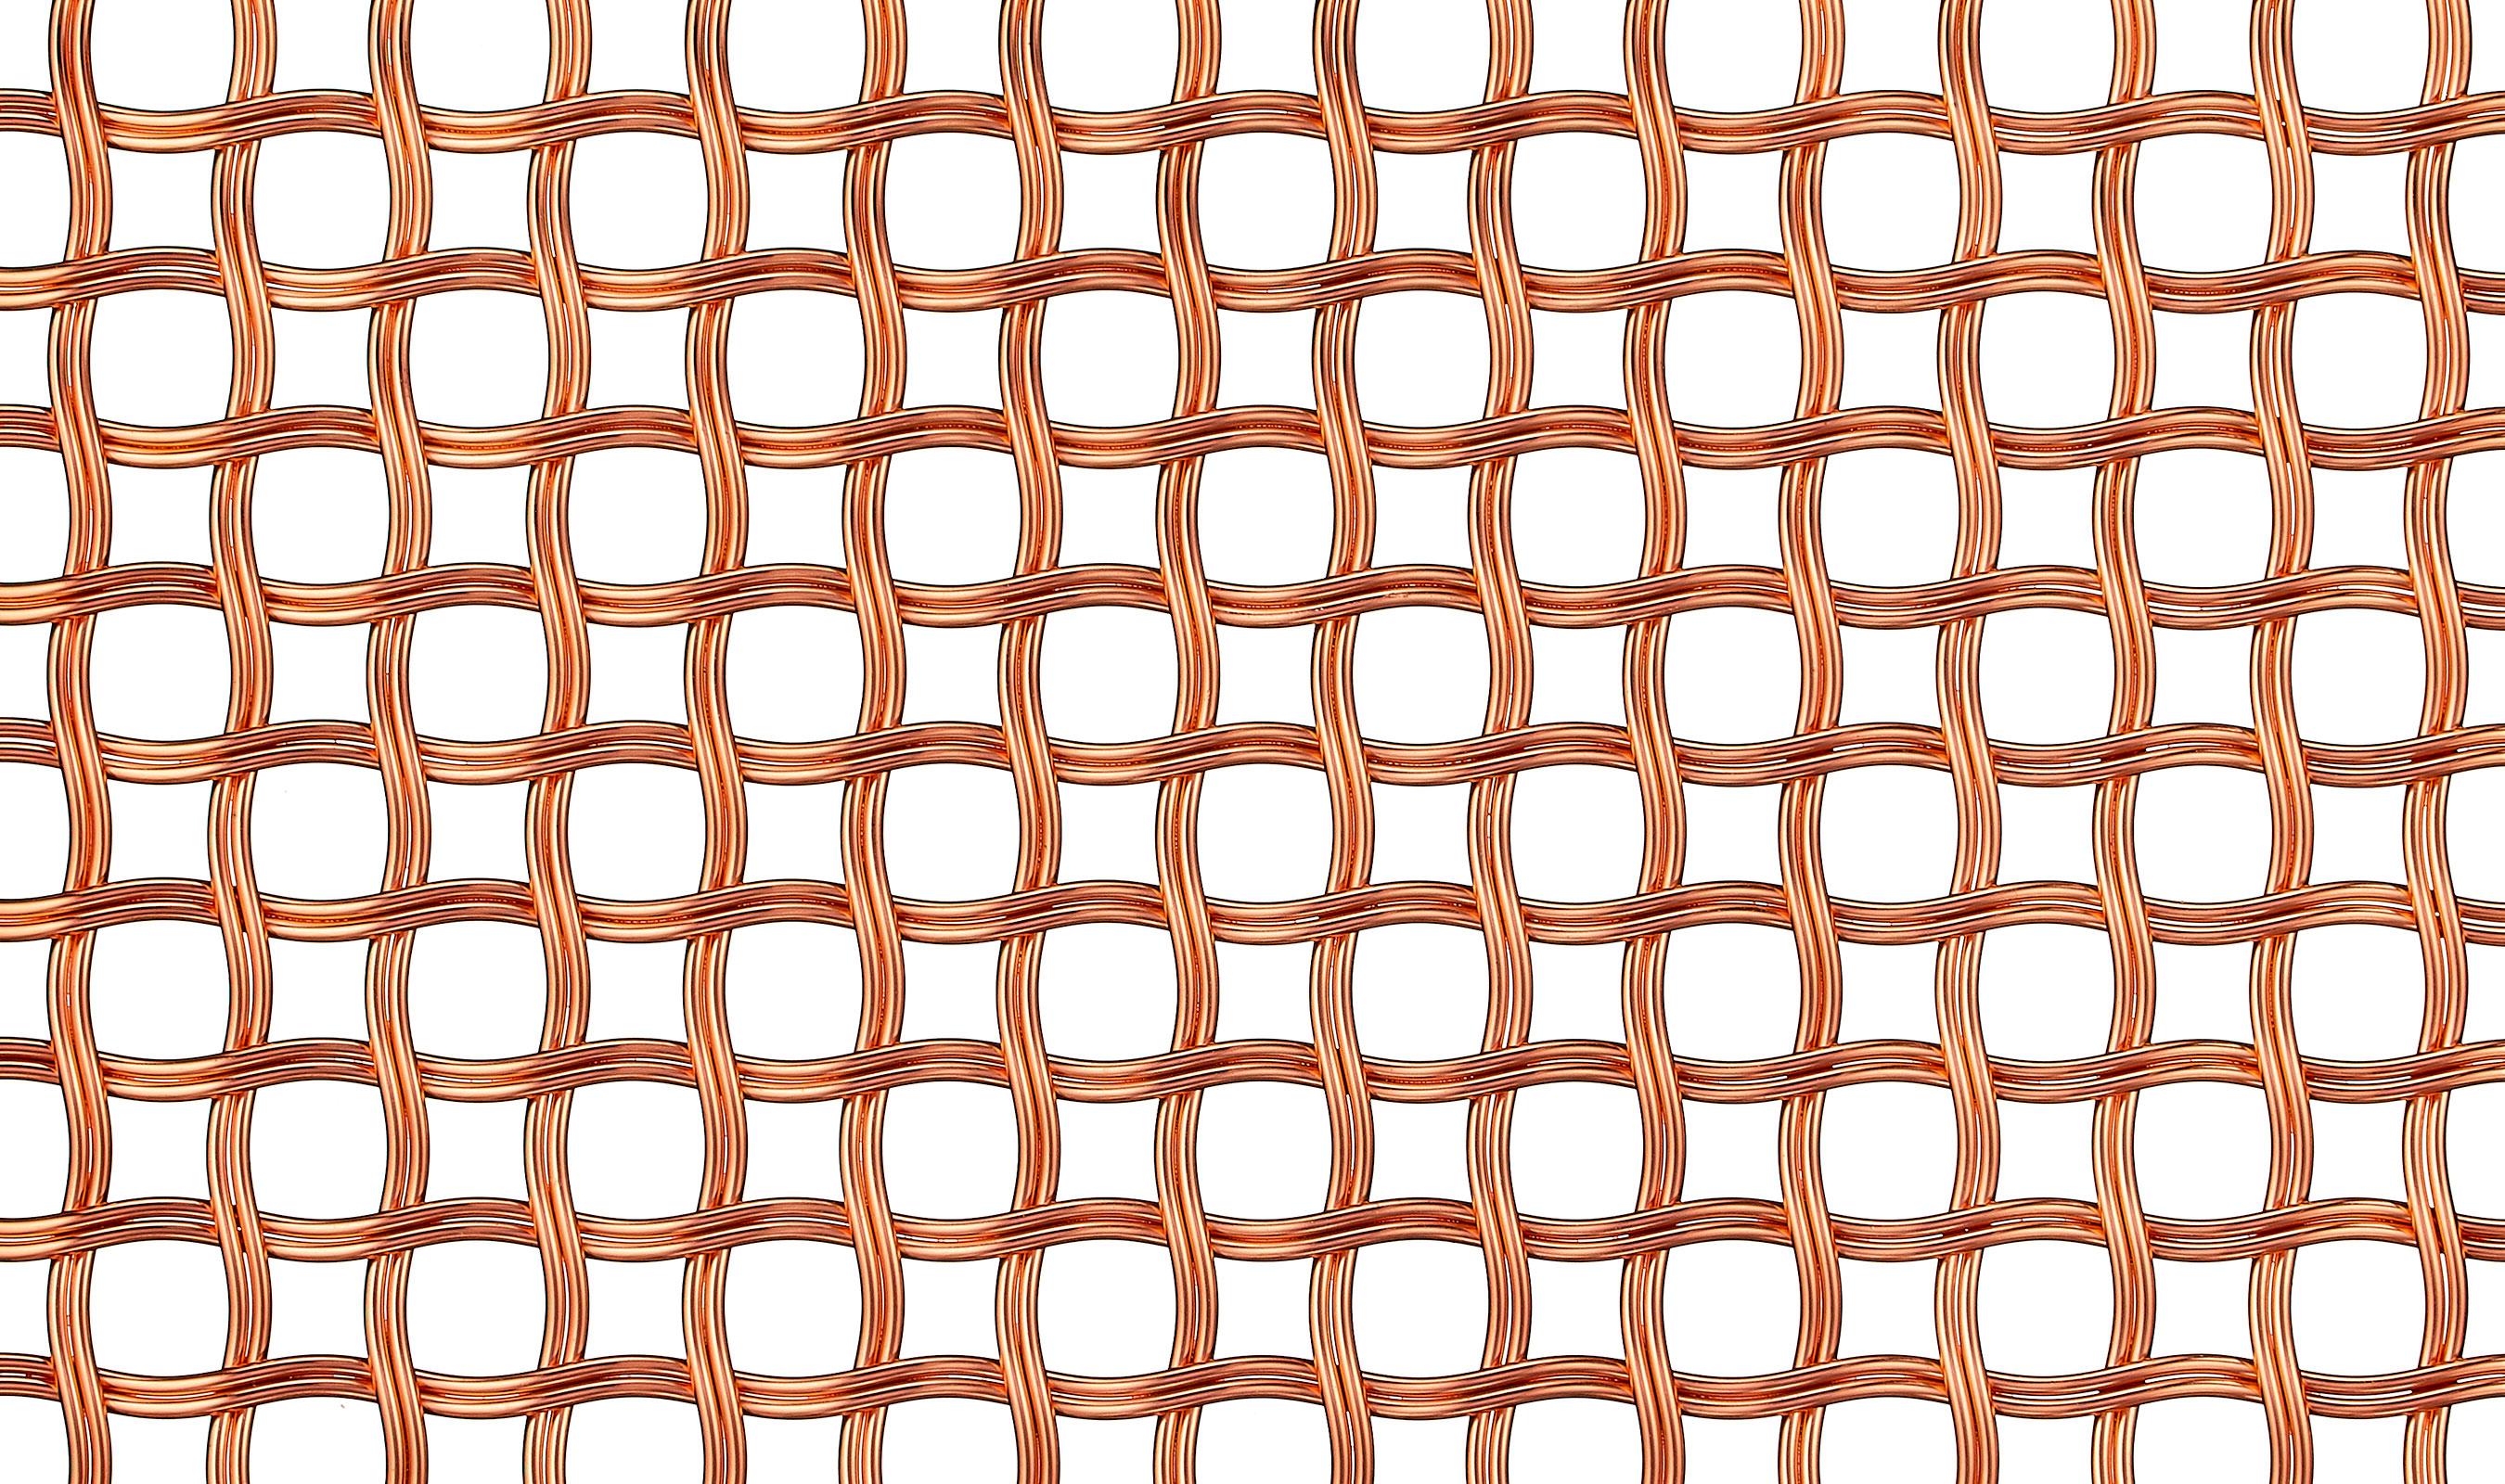 Banker Wire M22-80 decorative wire mesh shown in Bright Copper plated finish